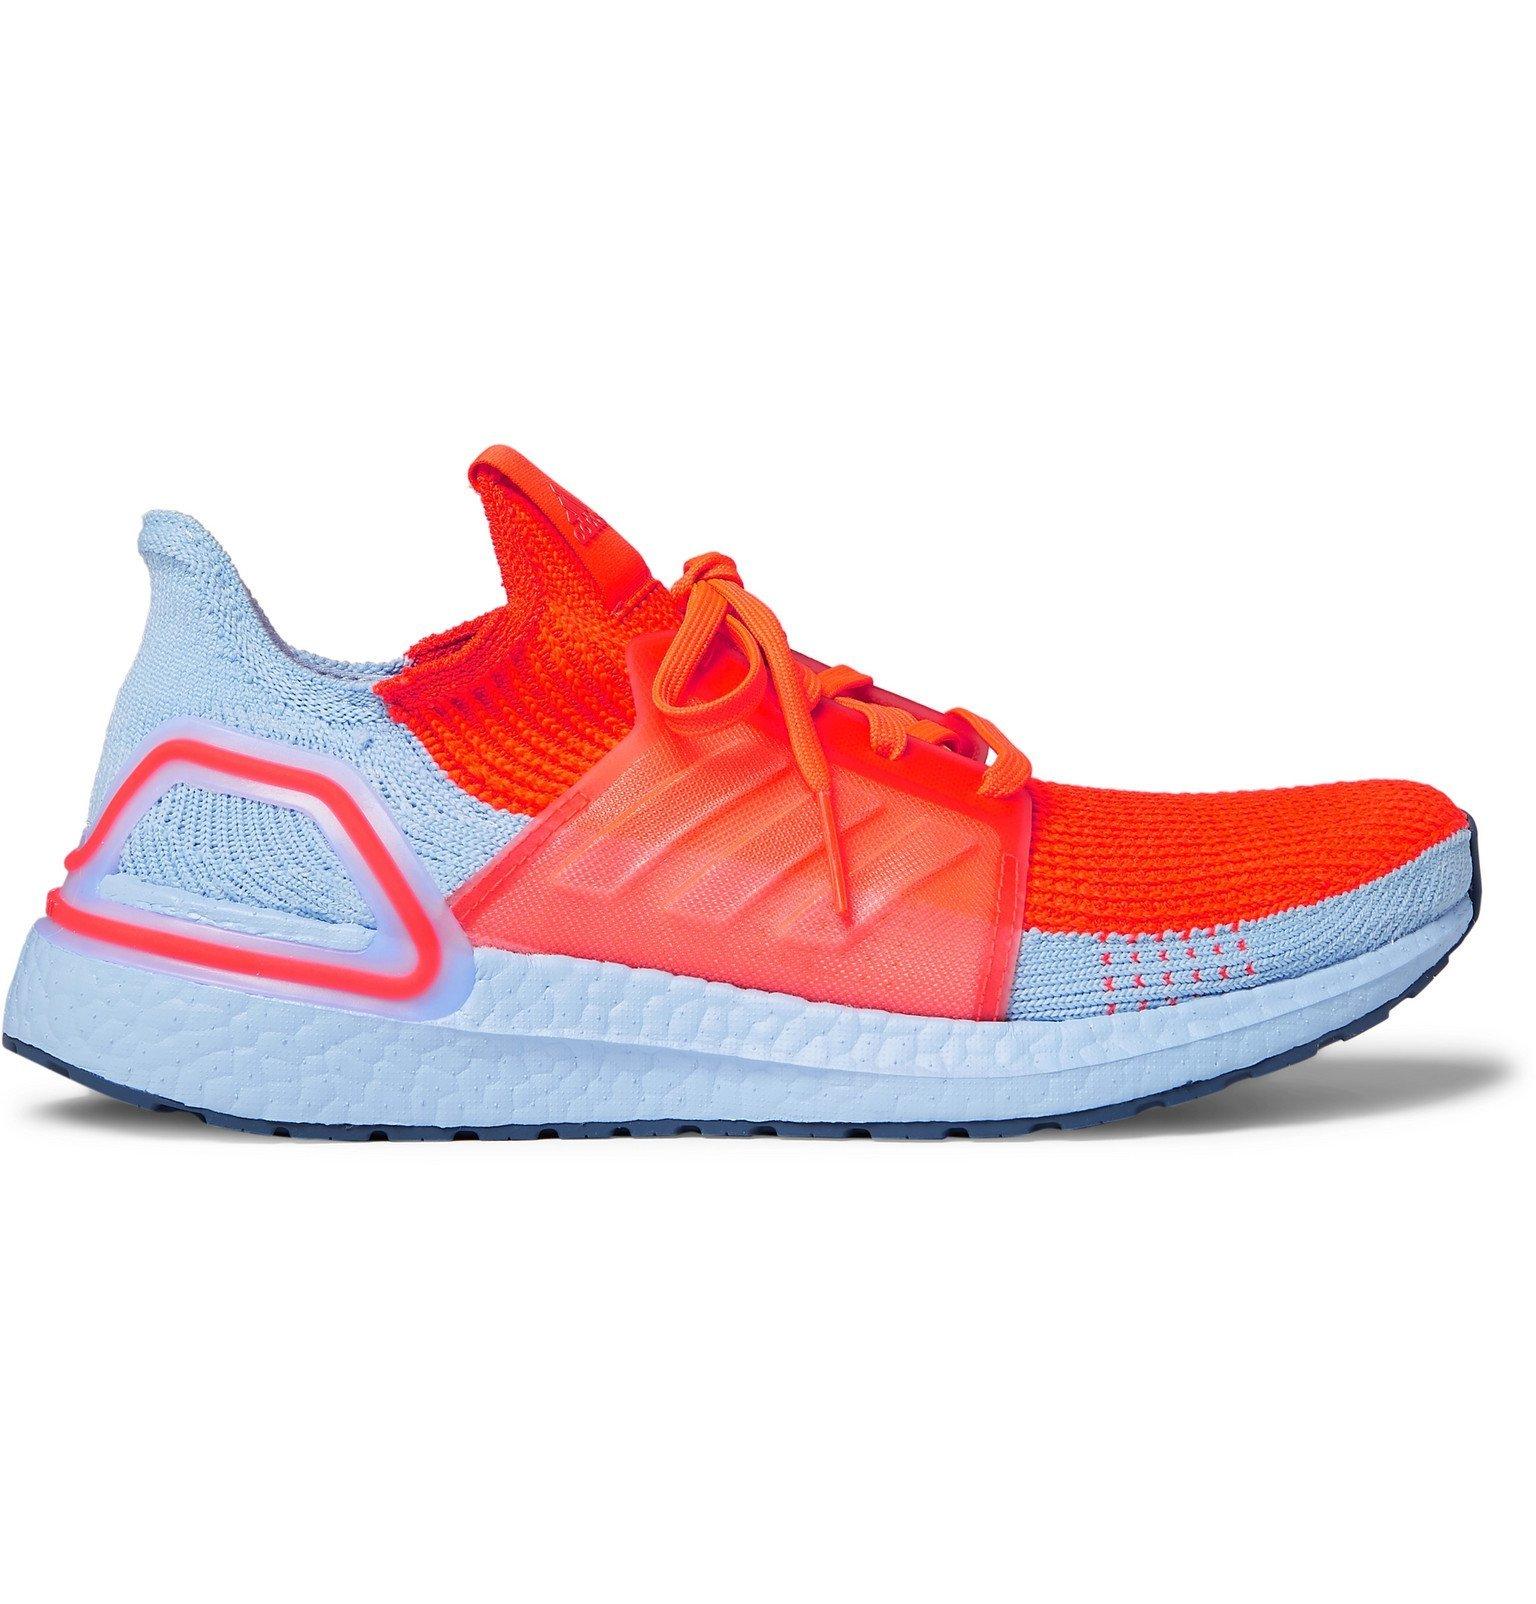 Photo: Adidas Sport - UltraBOOST 19 Rubber-Trimmed Primeknit Running Sneakers - Orange